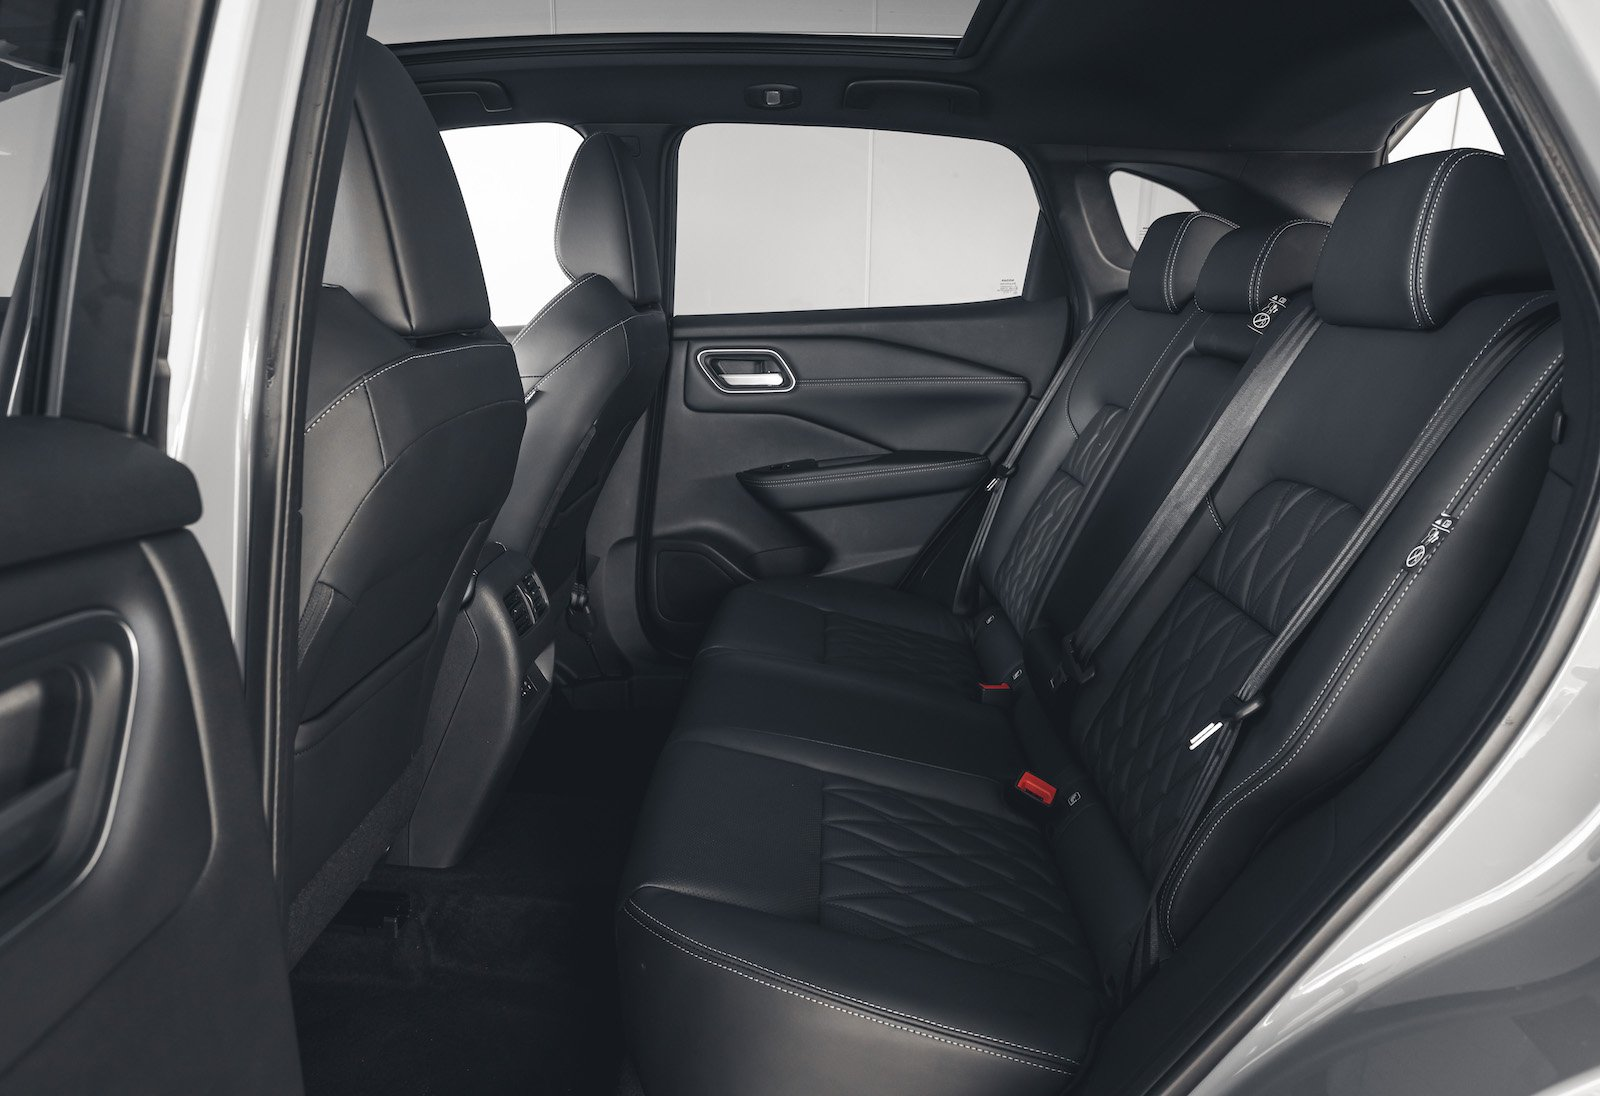 Nissan Qashqai 2021 interior rear seats